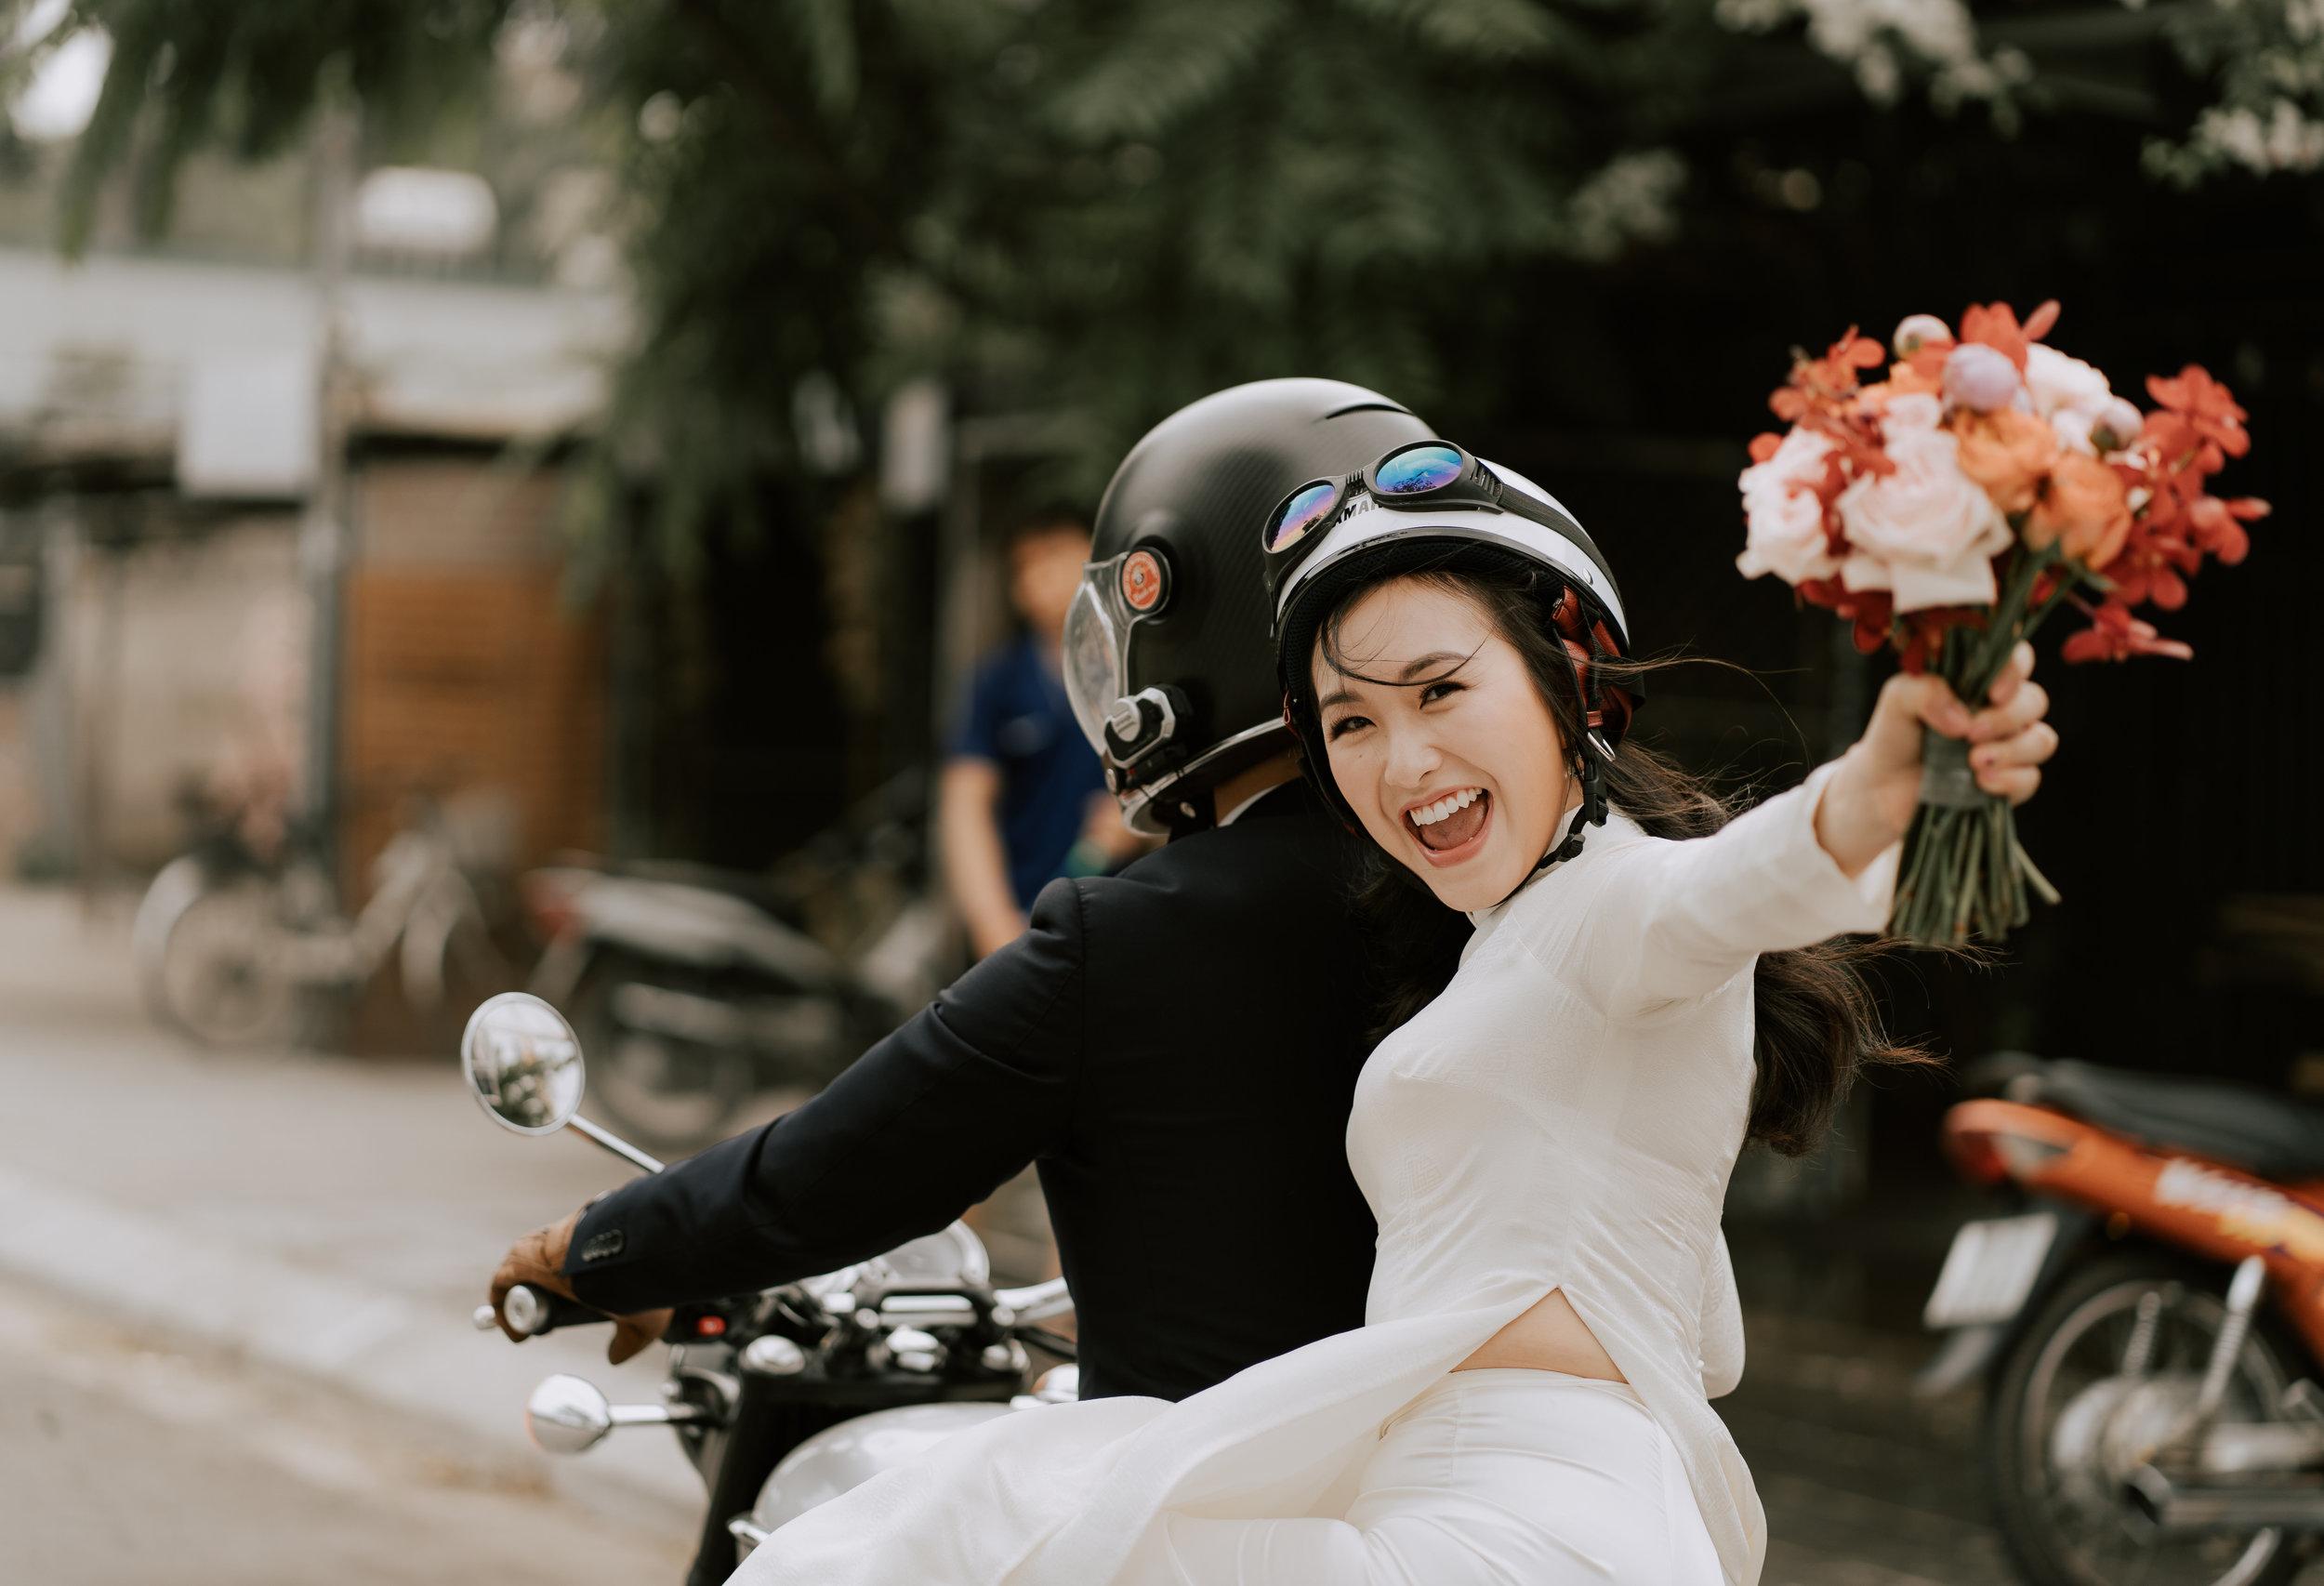 Mirrorwedding Destination Photographer TopofHanoi Duc Anh Hien Trang 095203.jpg